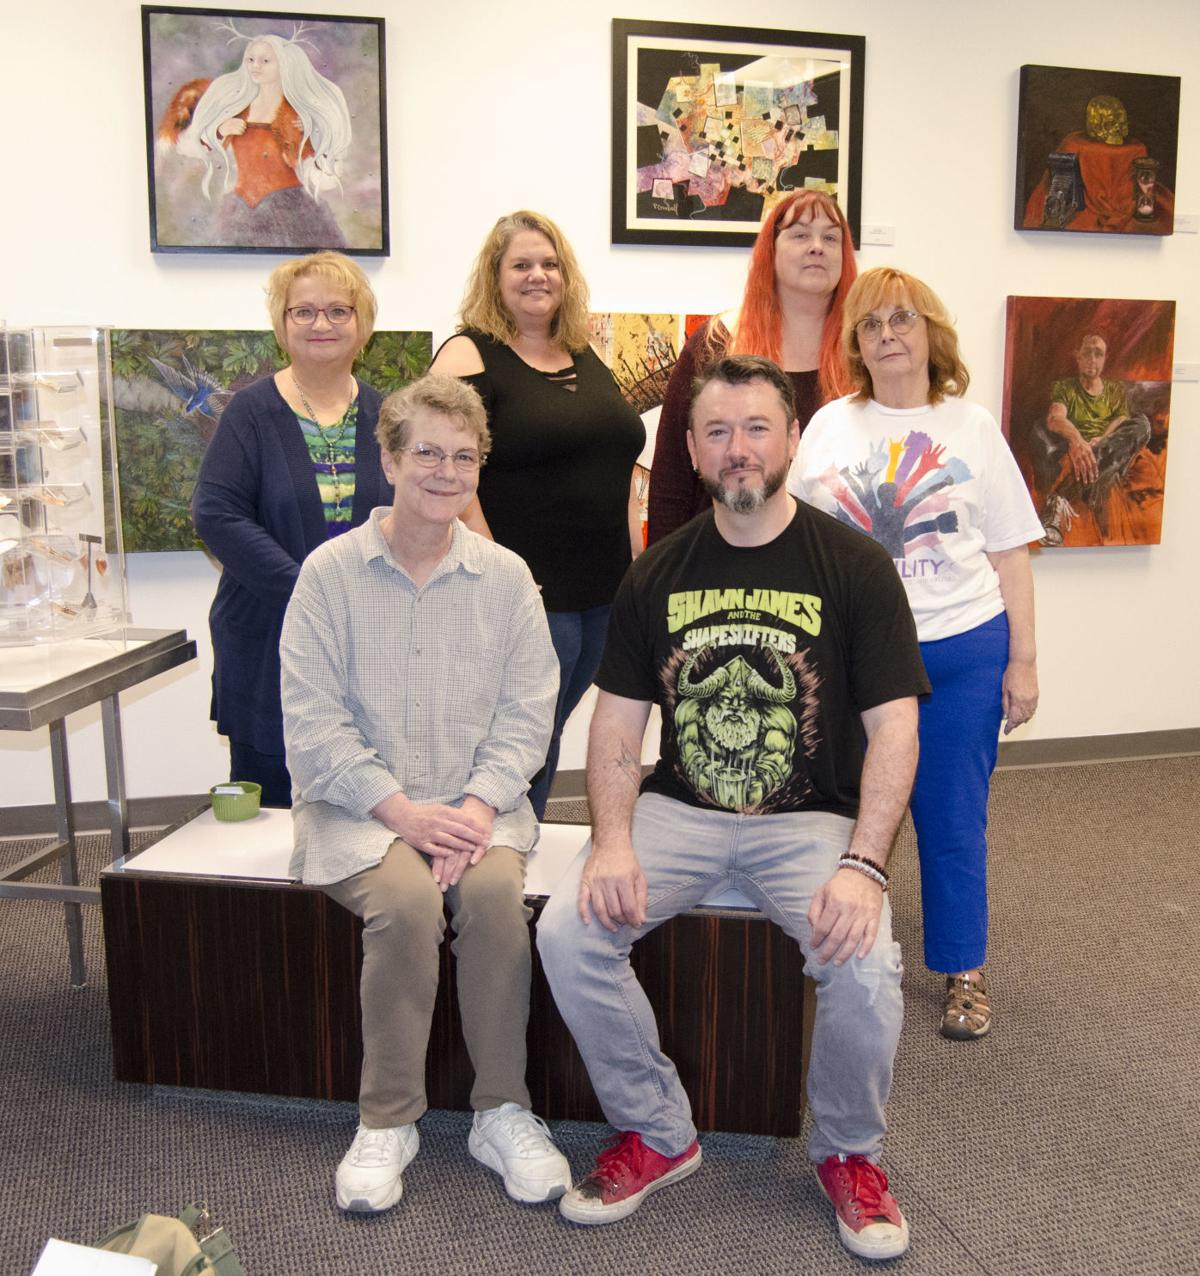 Gallery 103 artists